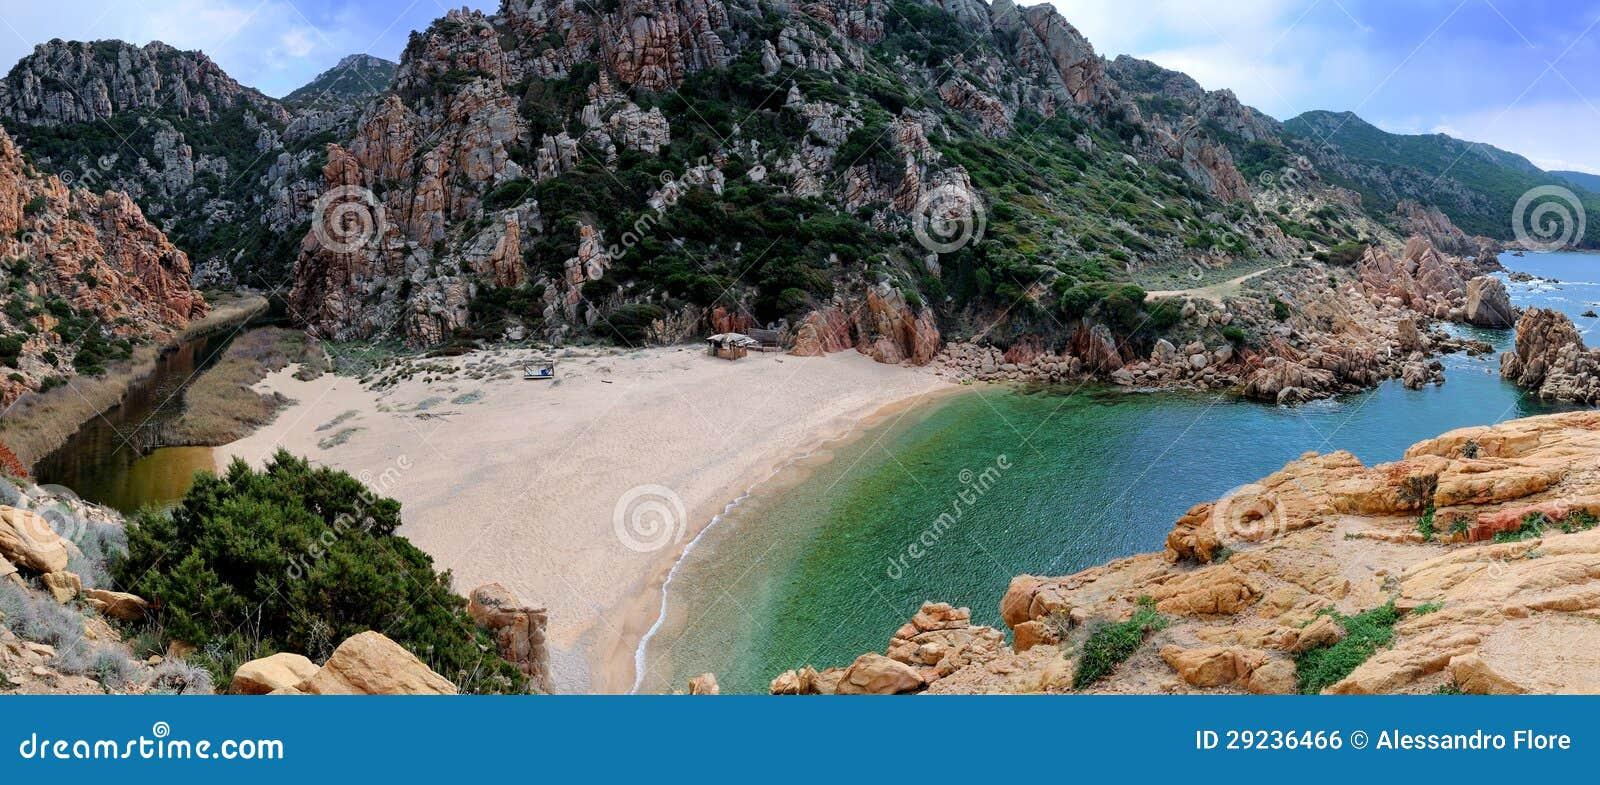 Download Cala Li Cossi foto de stock. Imagem de areia, montagem - 29236466